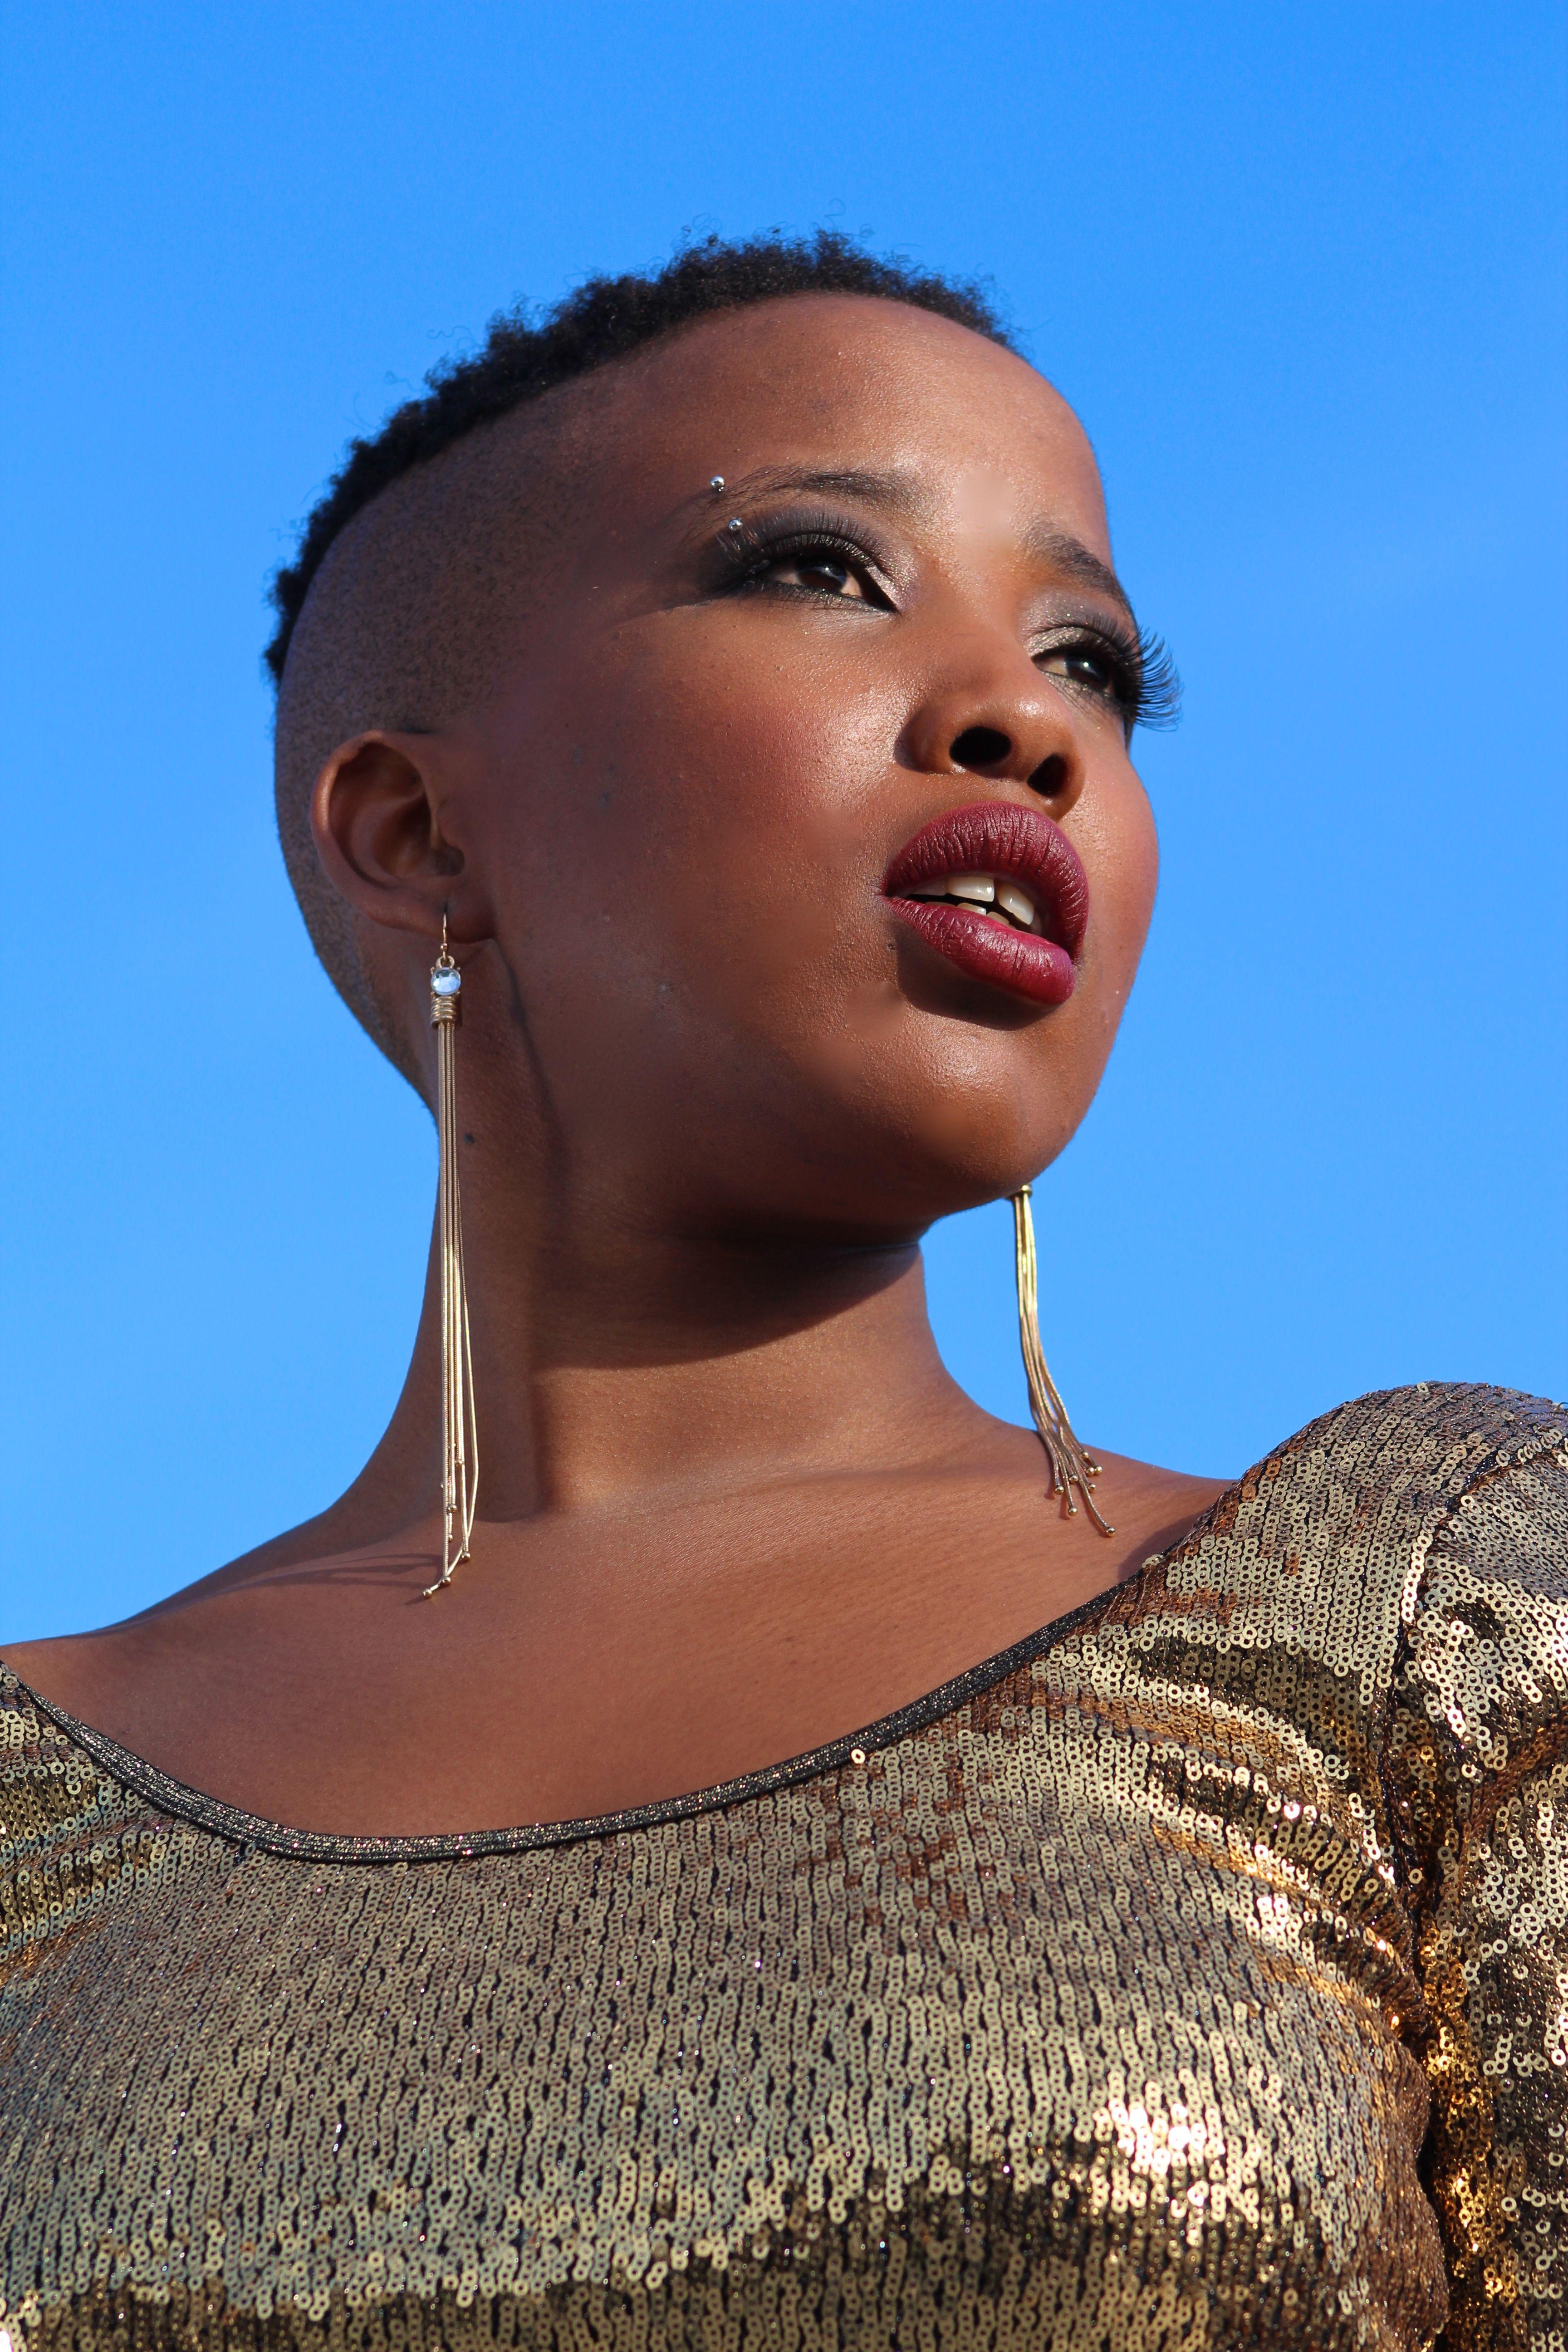 artagence coiffure africaine moderne south africa xhosa. Black Bedroom Furniture Sets. Home Design Ideas